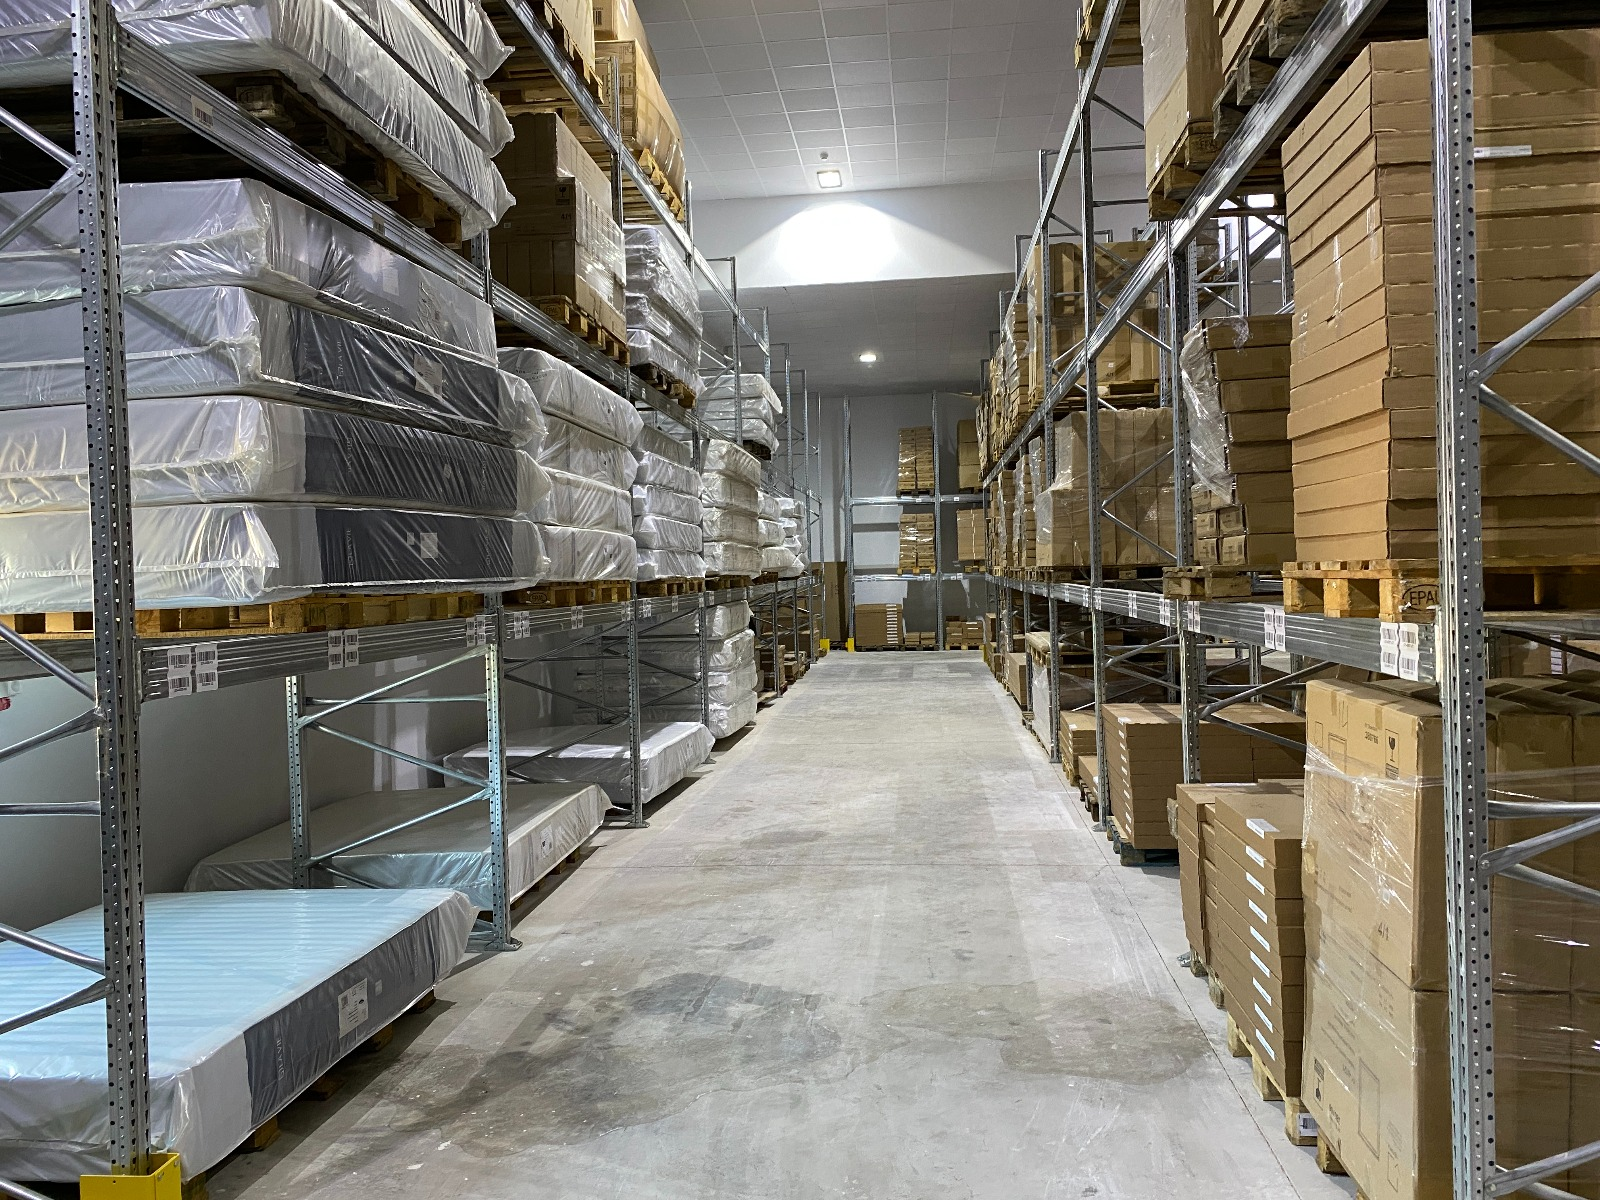 Logistics warehouse image #4